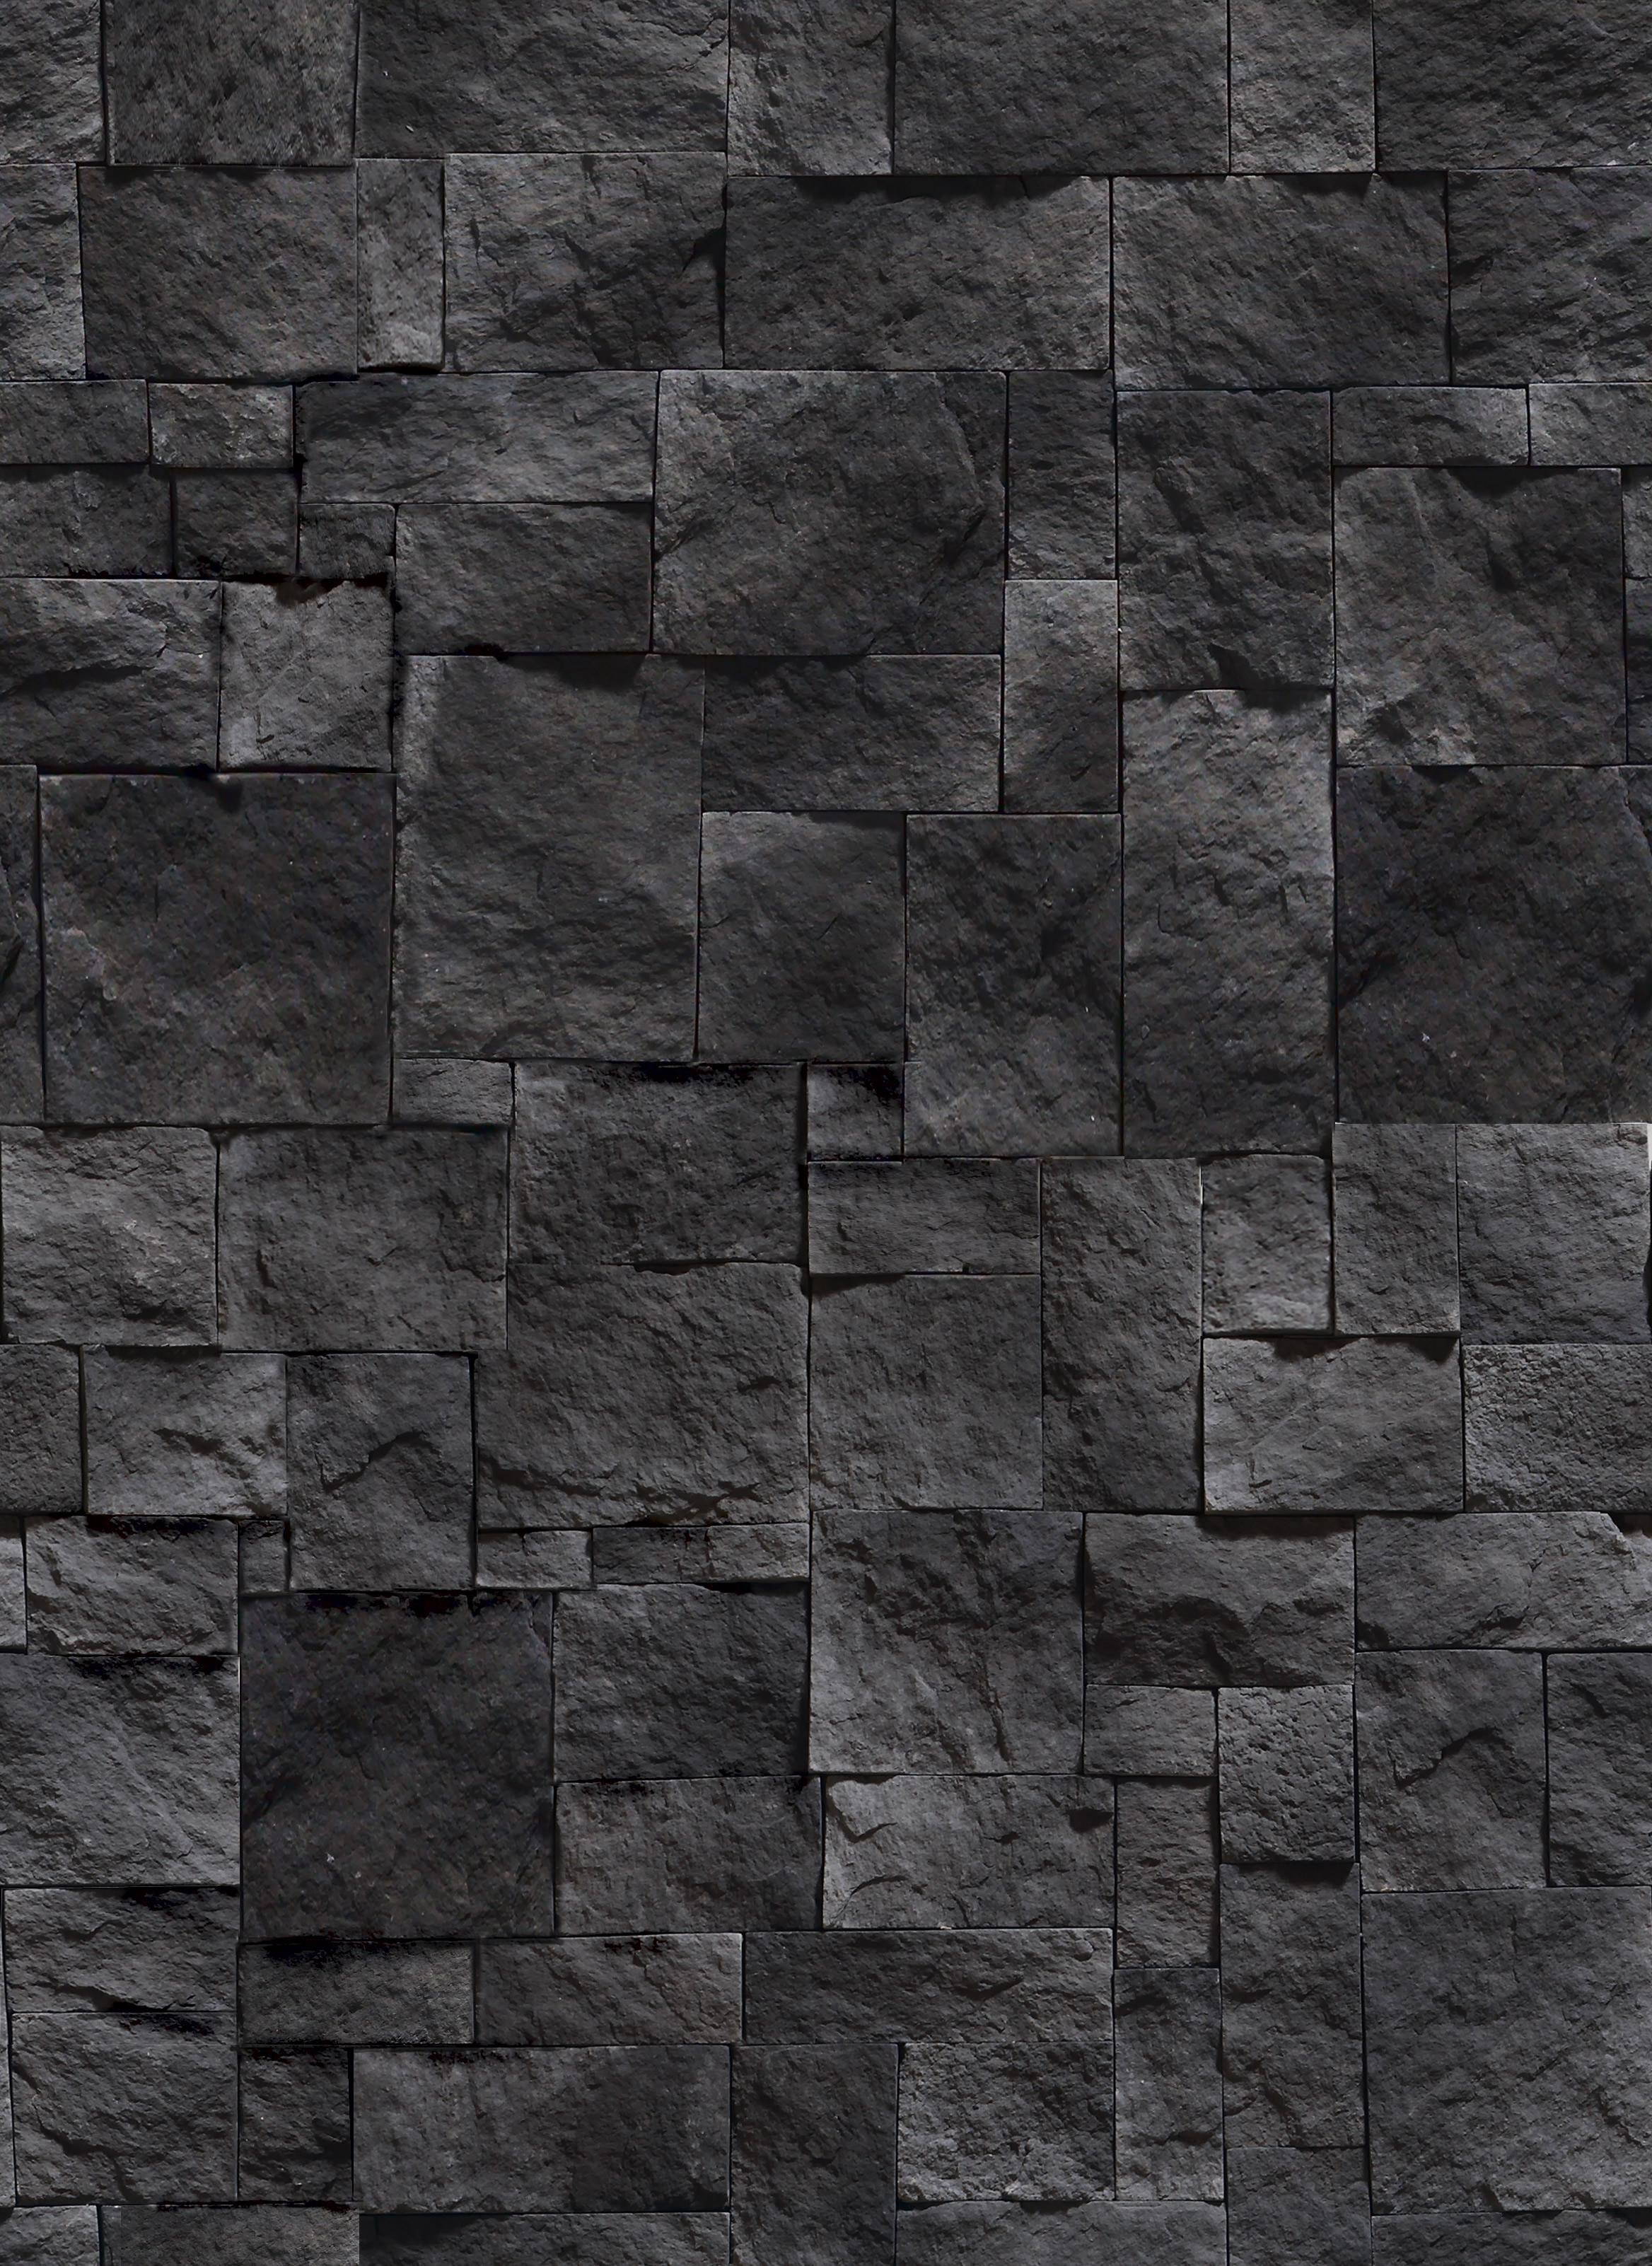 black stone, download photo, background, texture, stone texture